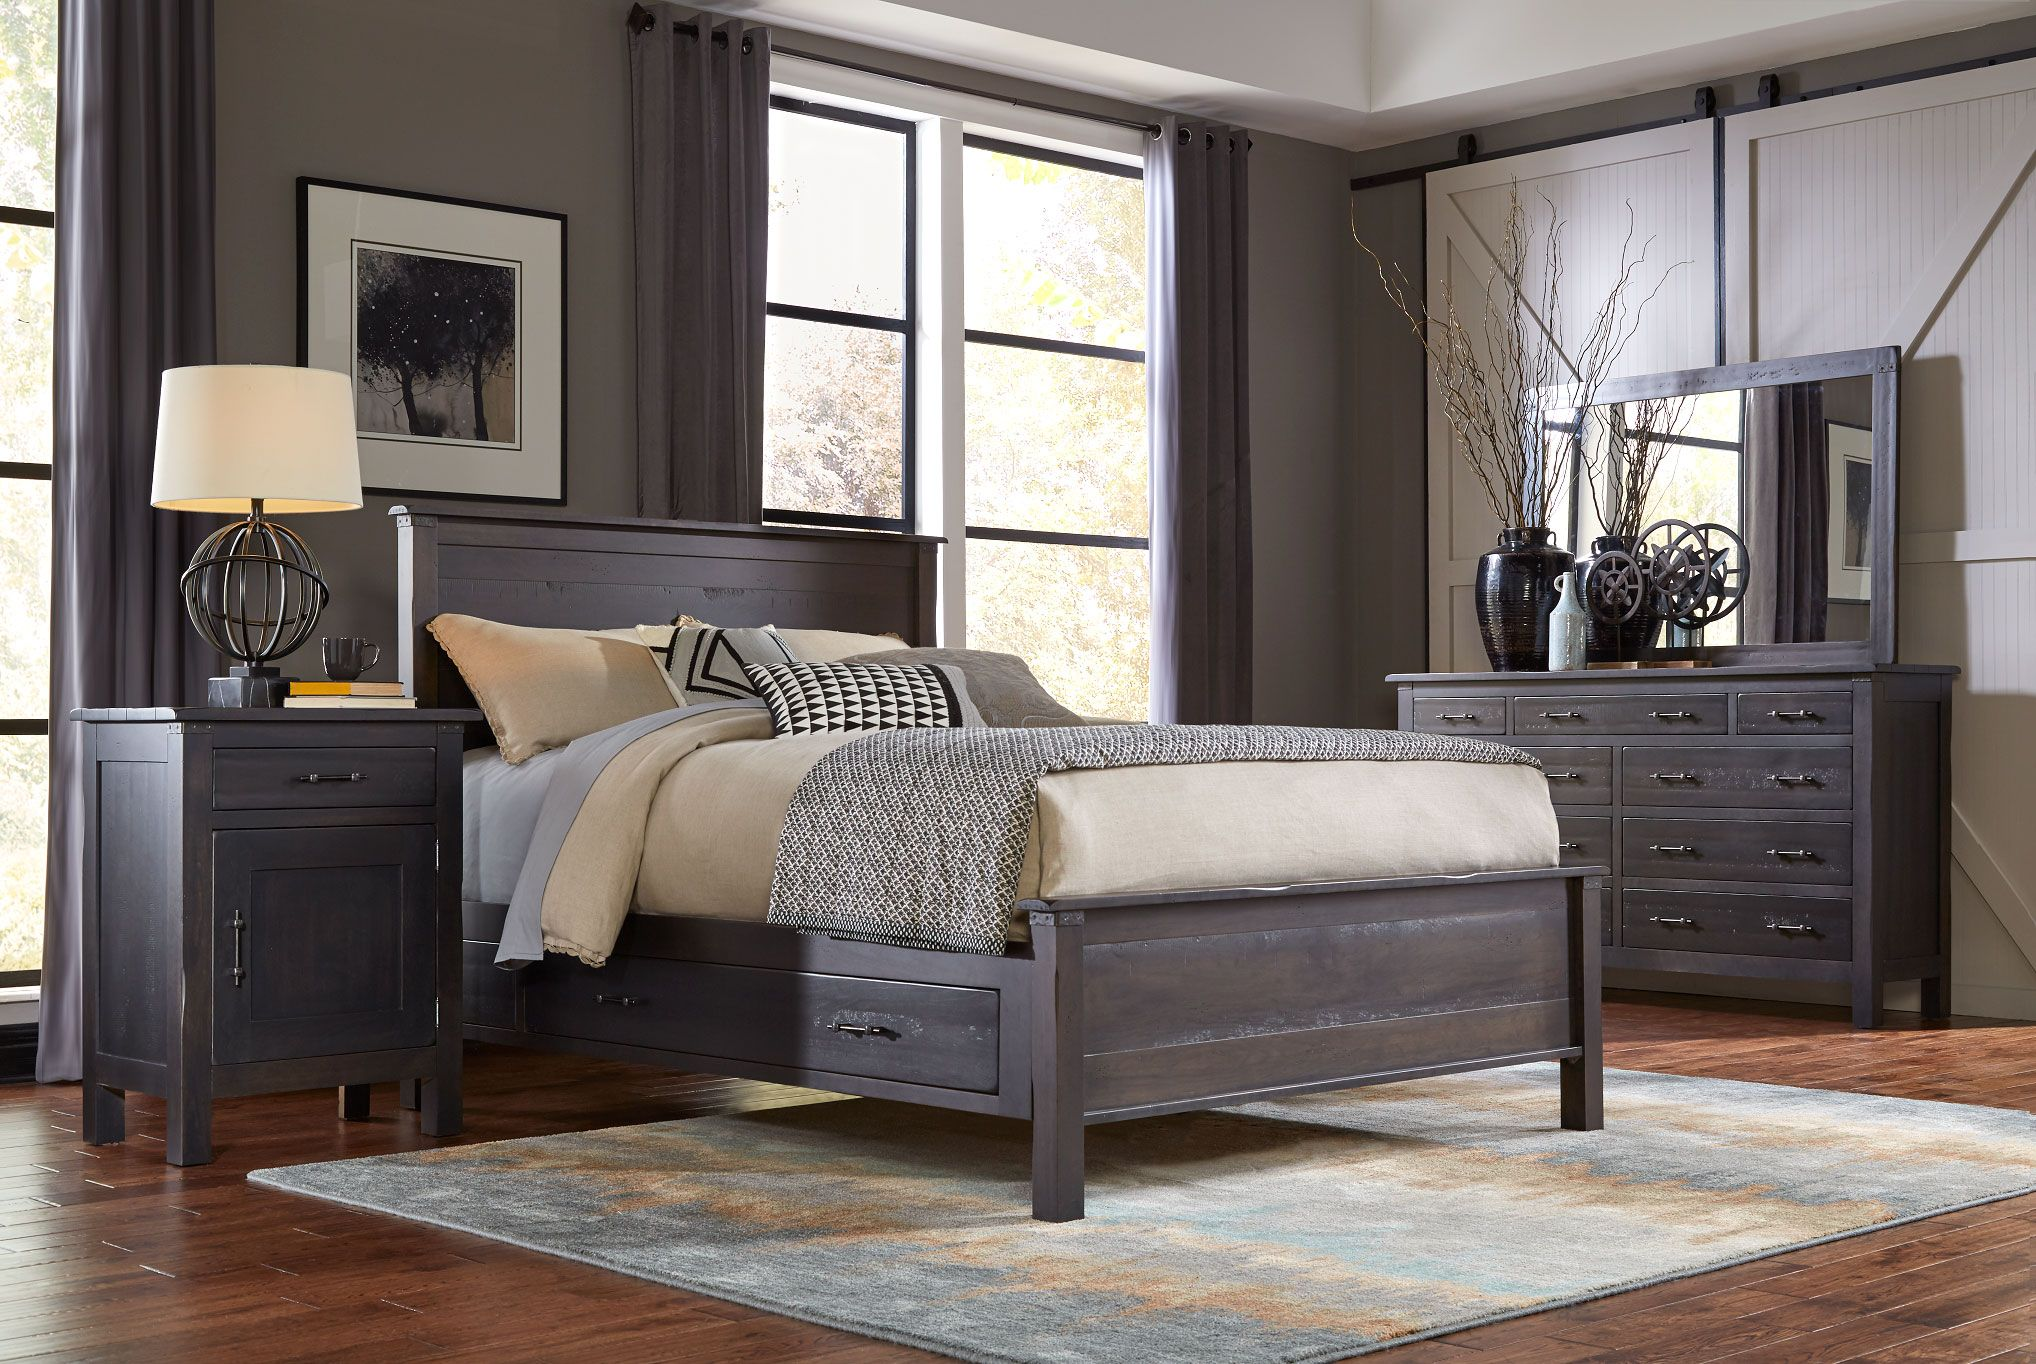 Wildwood Amish Bed Wood bedroom, Furniture, Amish furniture